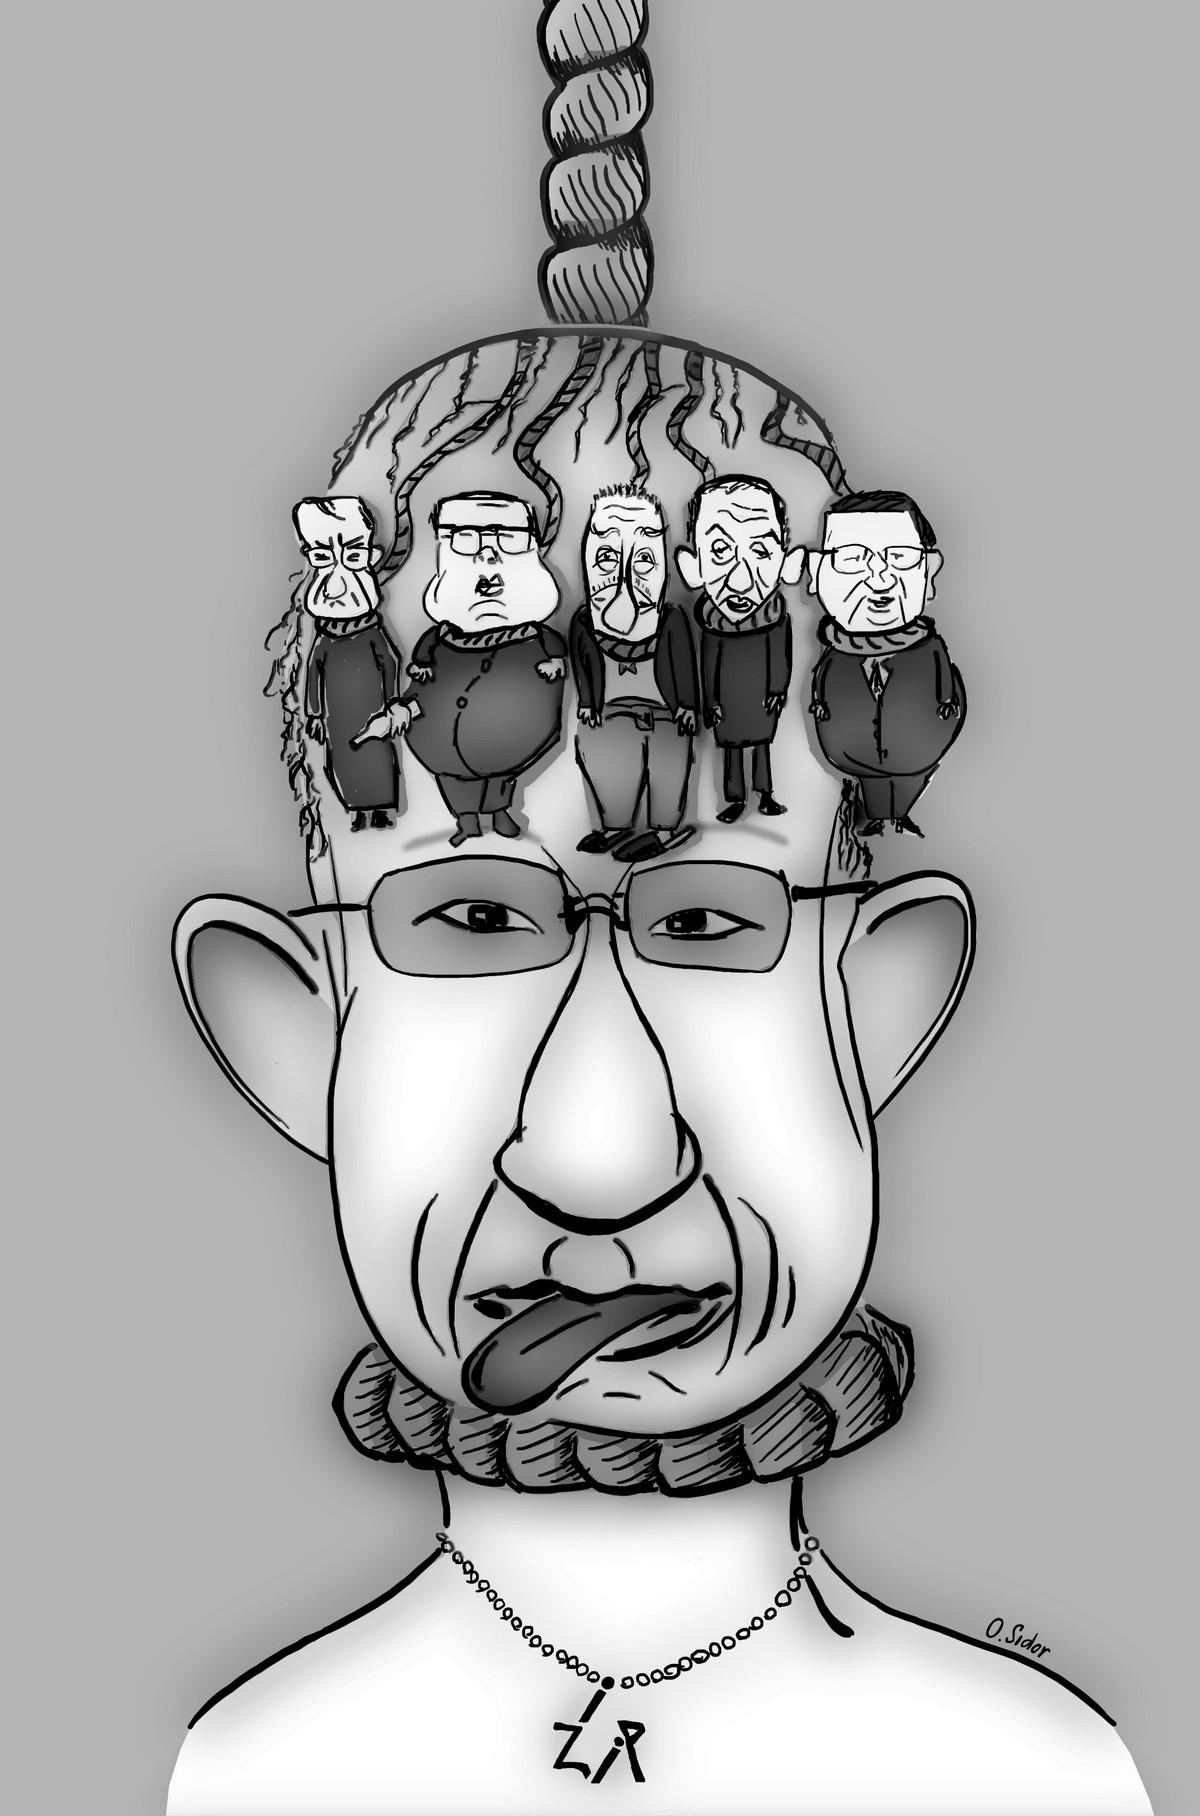 Izip (karikatura | mpsv)